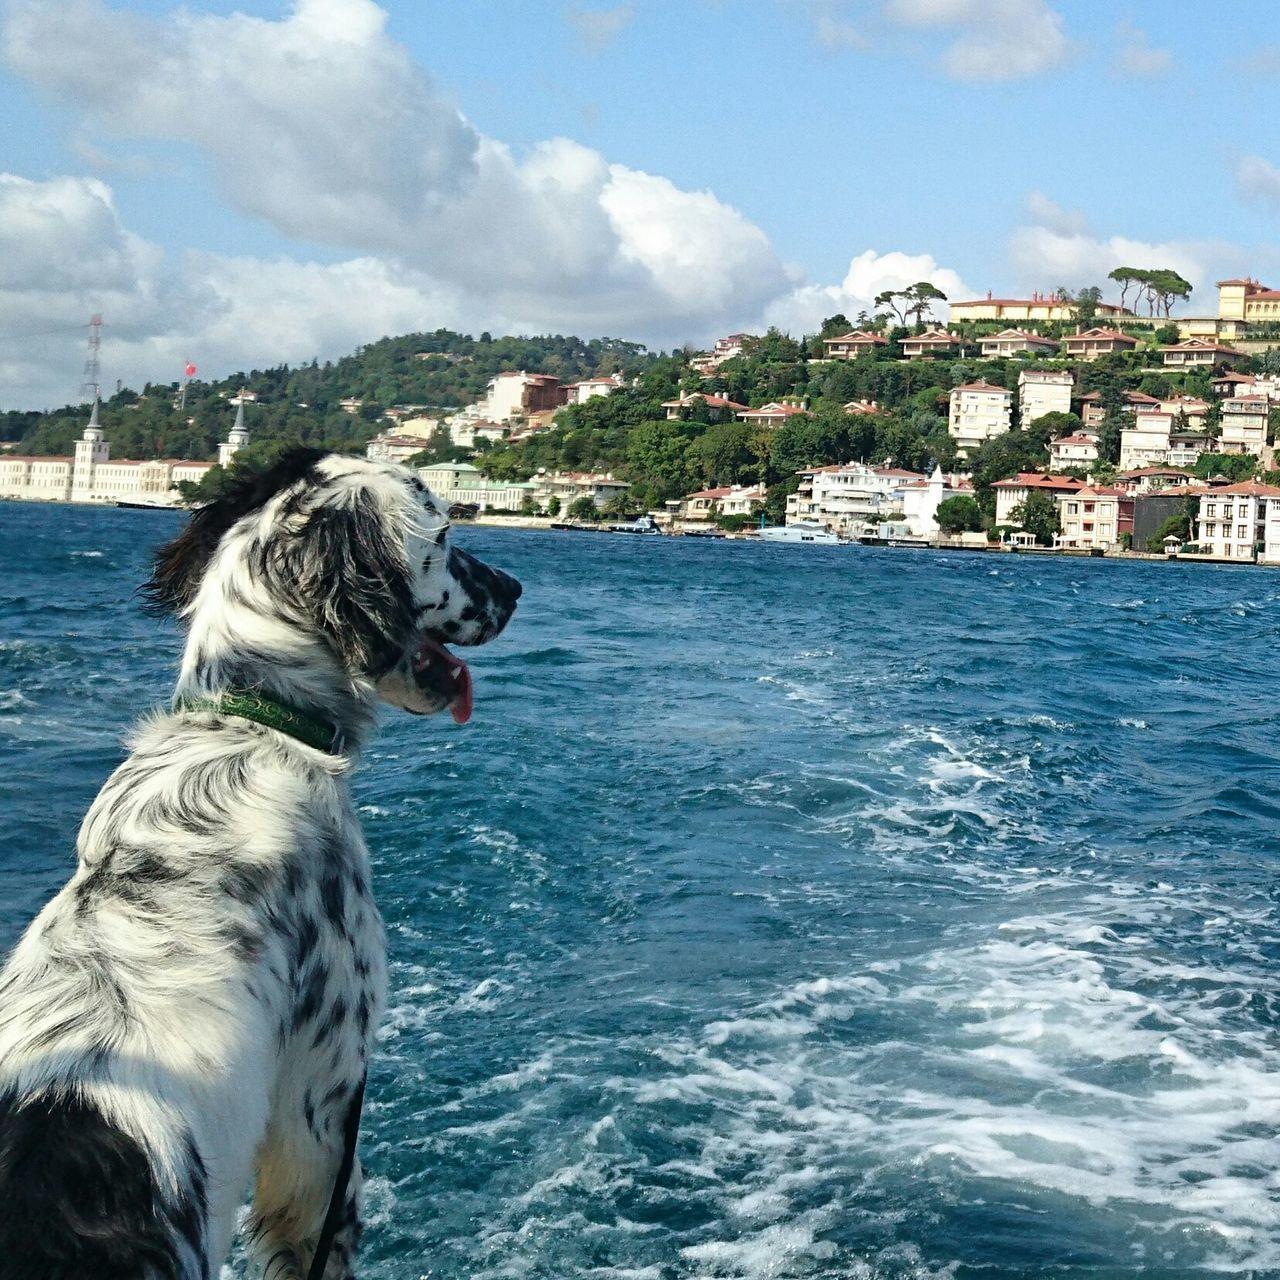 LeoDayı Relaxing Eye4photography  Eye Em Best Shots Taking Photos The Purist (no Edit, No Filter) Summerdogs Dog Istanbul Turkiye Britishsetter